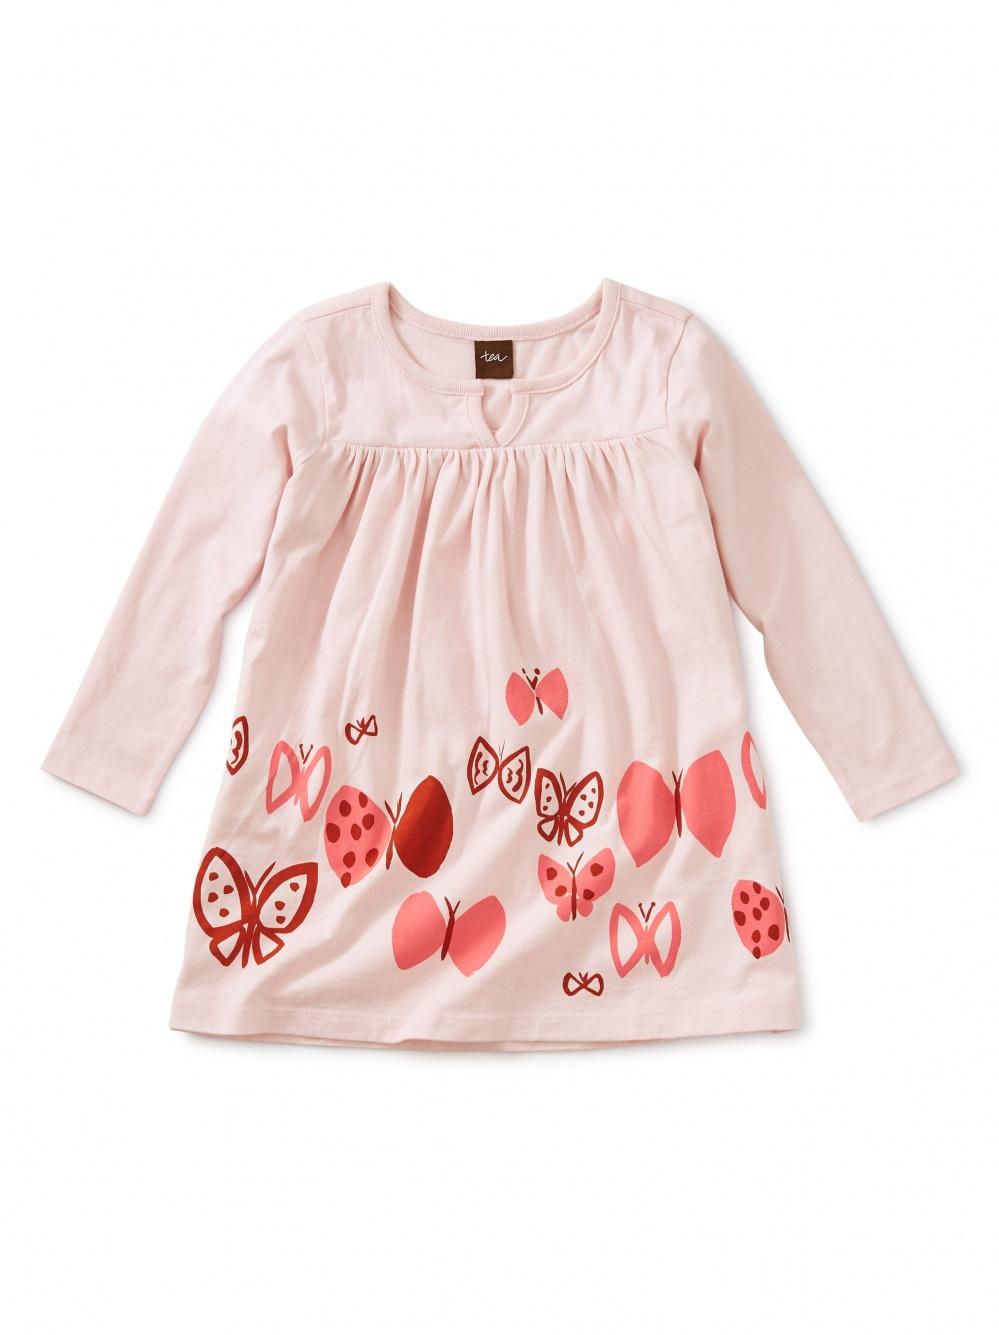 Butterflies Graphic Baby Dress